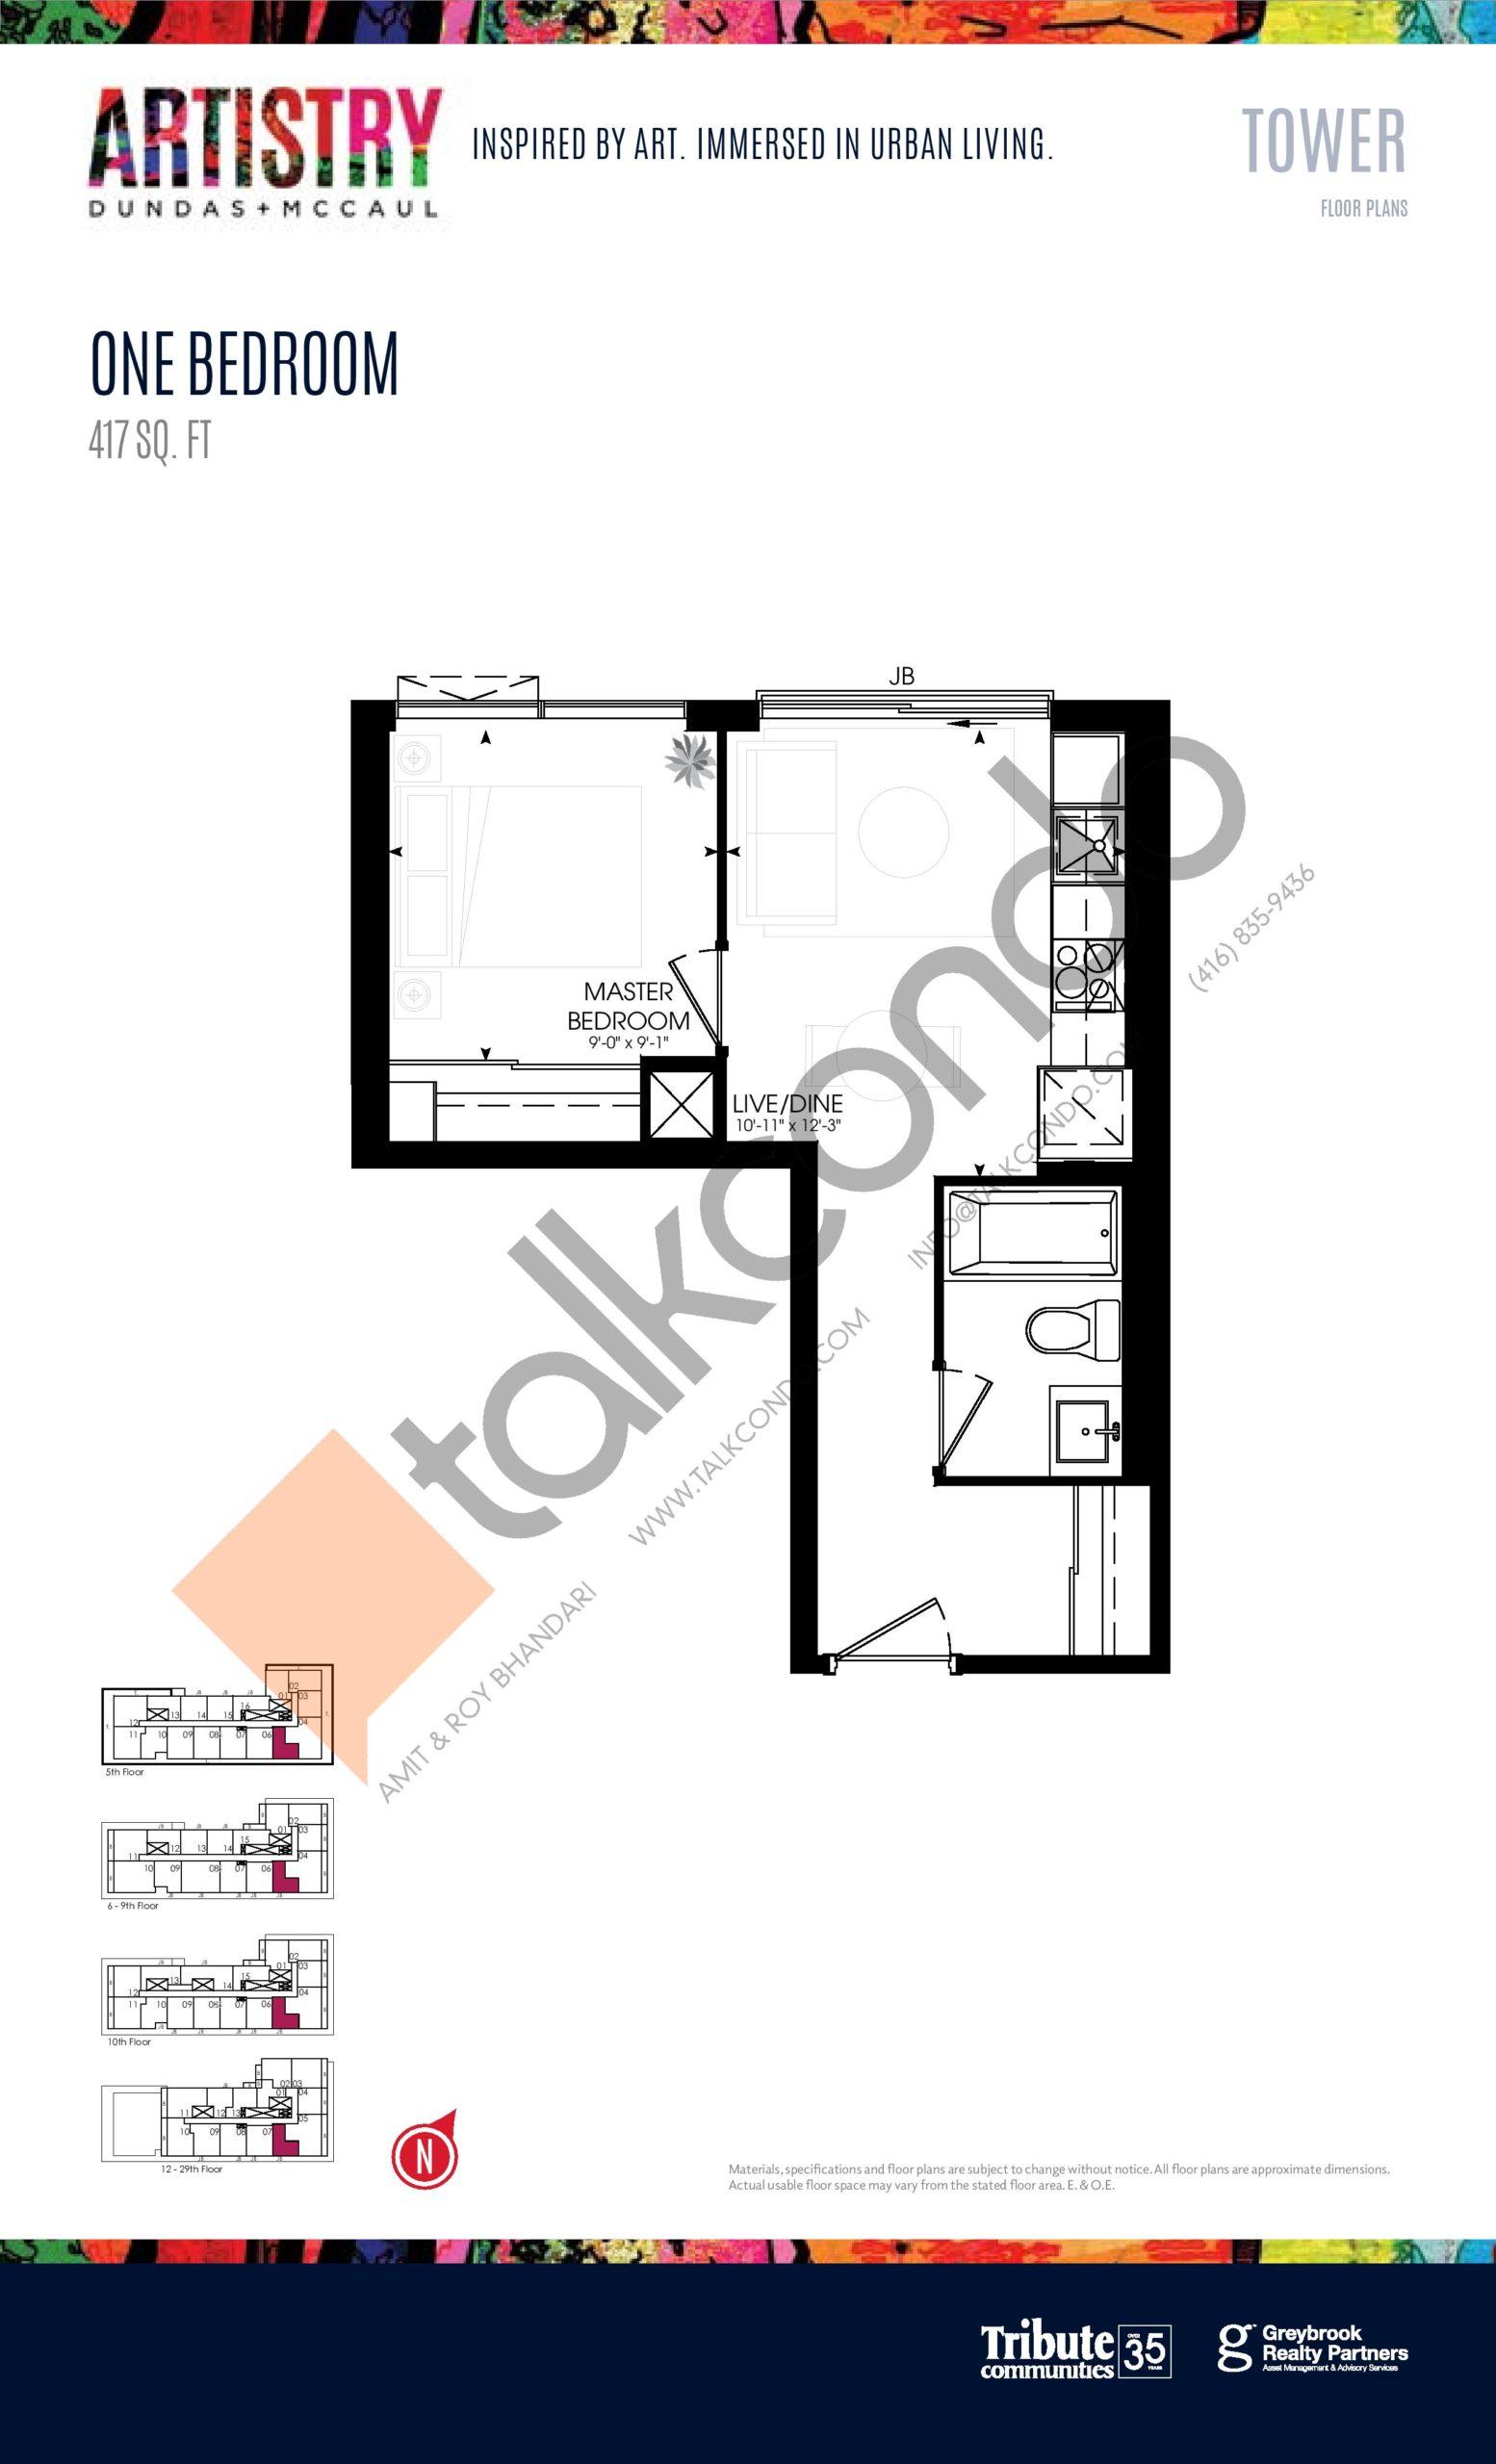 417 sq. ft. - Tower Floor Plan at Artistry Condos - 417 sq.ft